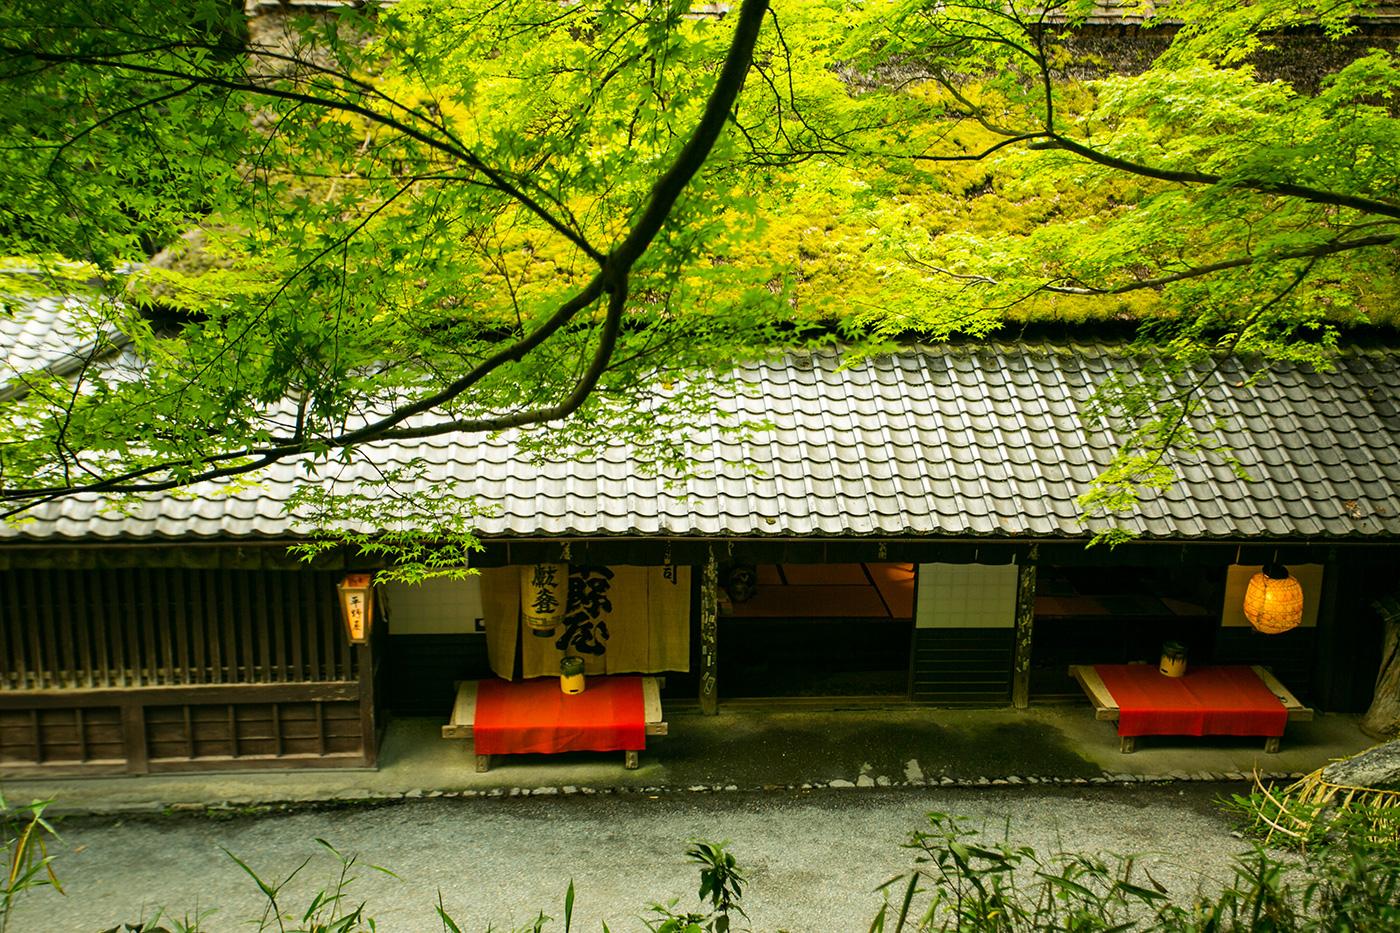 http://ayuchaya-hiranoya.com/wp-content/themes/theme2014/common/images/spring/top_bg_01.jpg